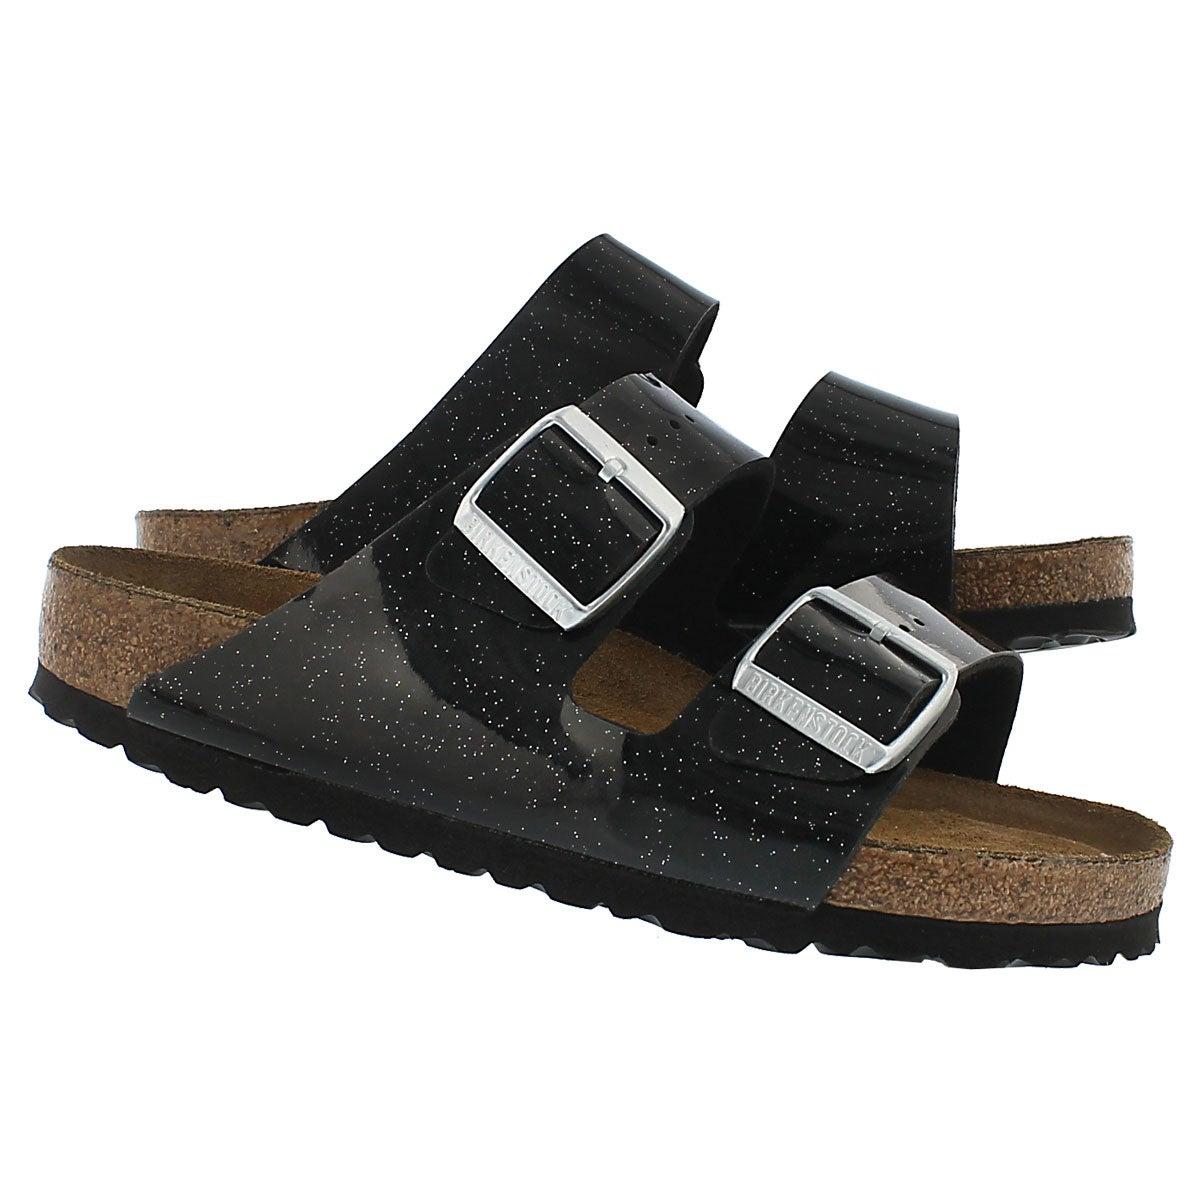 Lds Arizona SF magic galaxy blk sandal